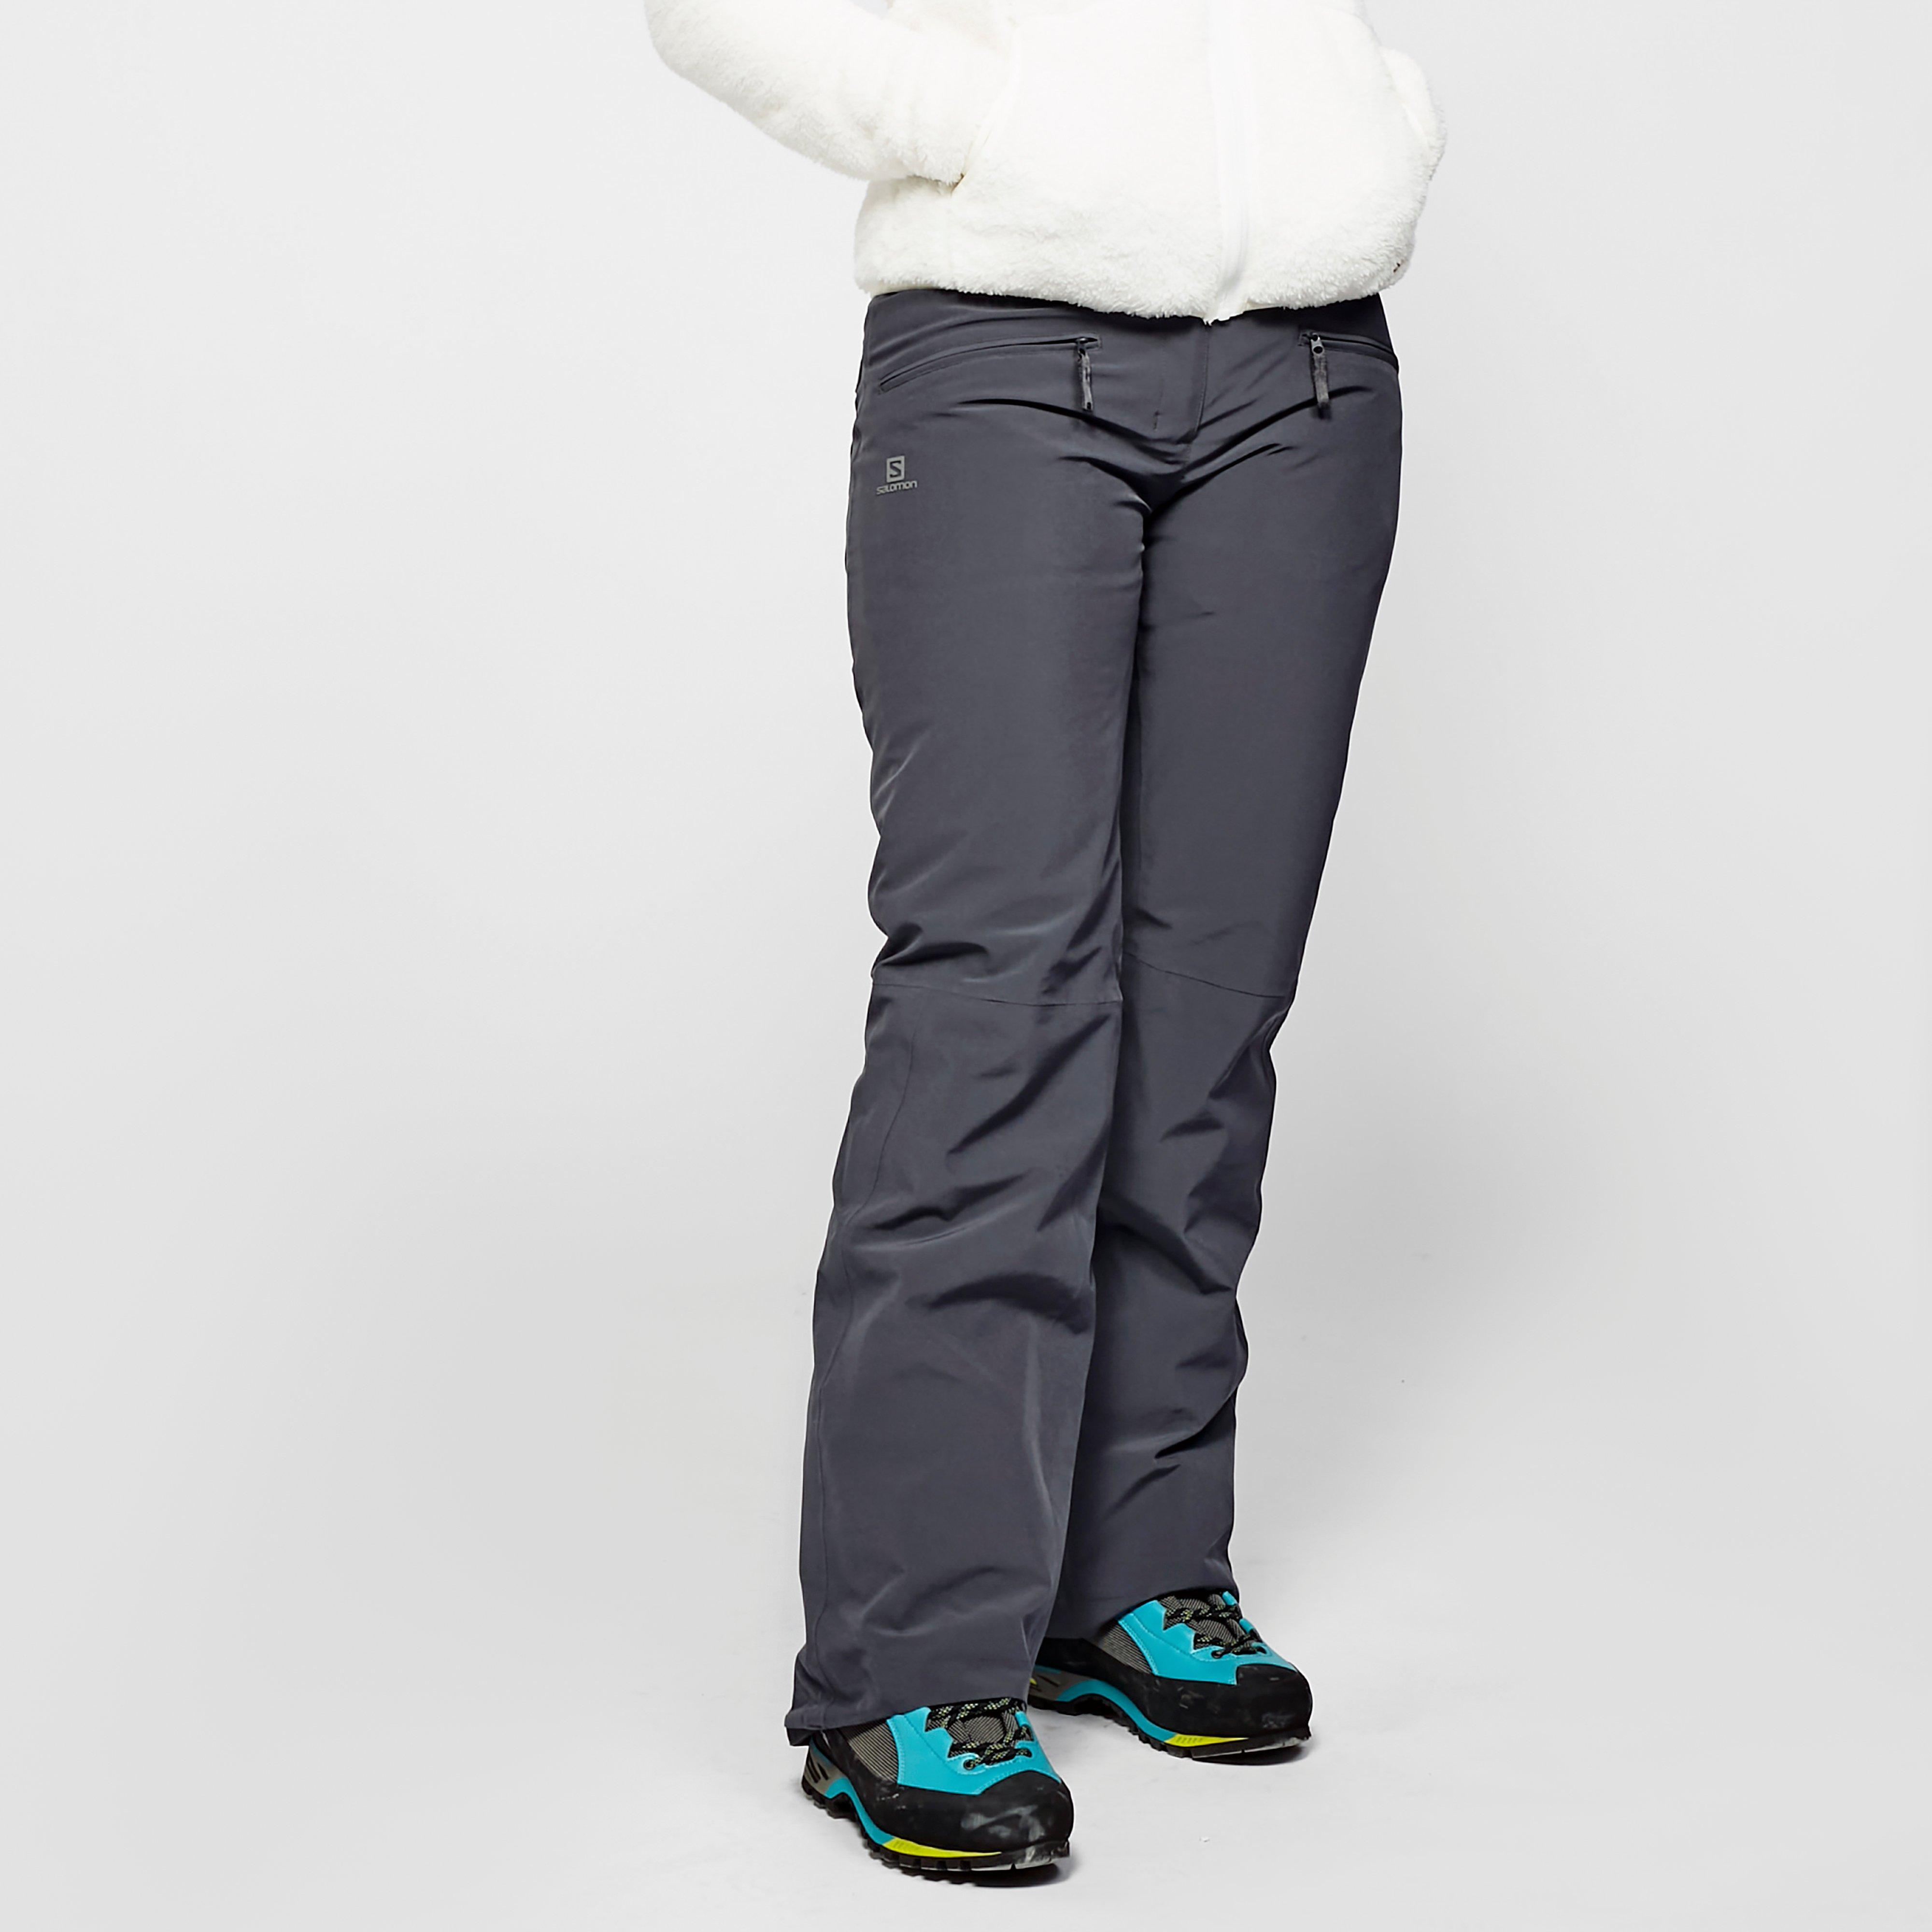 Salomon Womens Edge Ski Pants - Grey/gry  Grey/gry